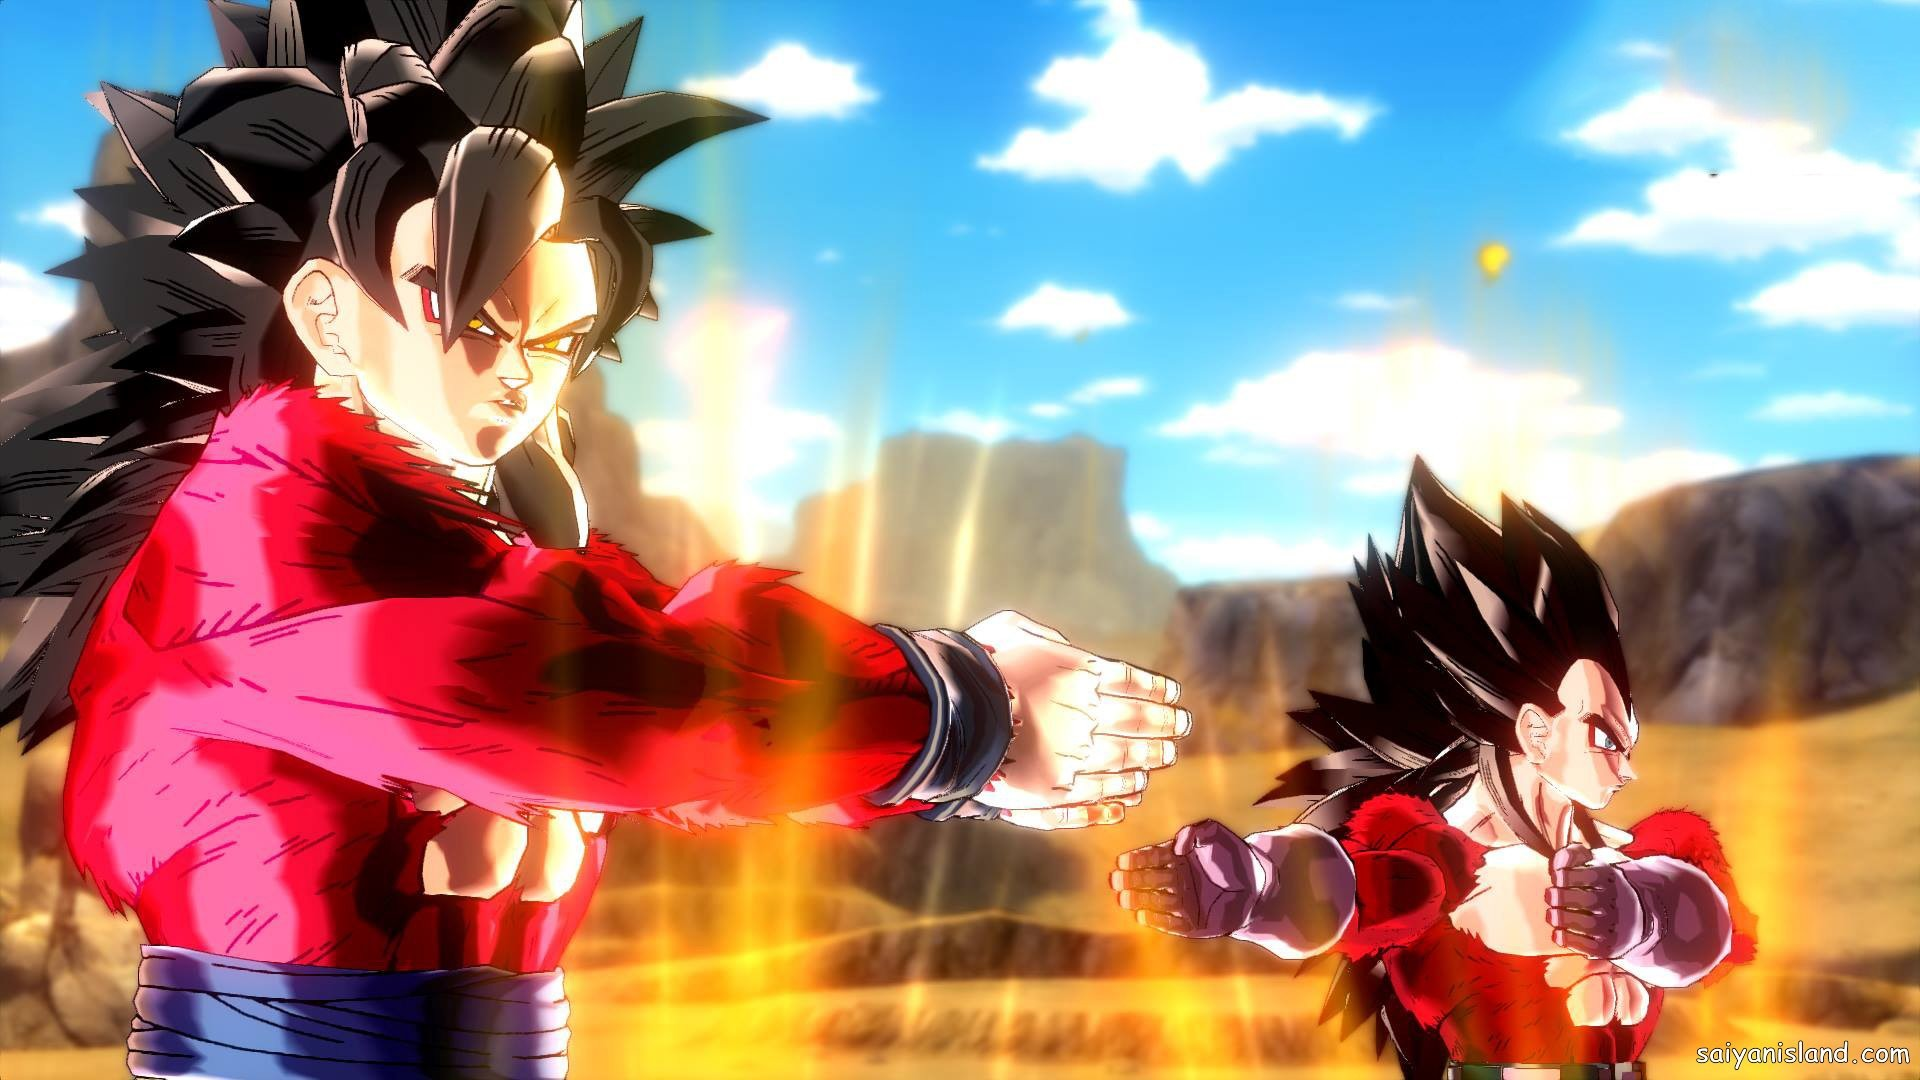 DBXV SSJ4 Goku & SSJ4 Vegeta Fusion Dance GT Pack 2 DLC 31.jpg